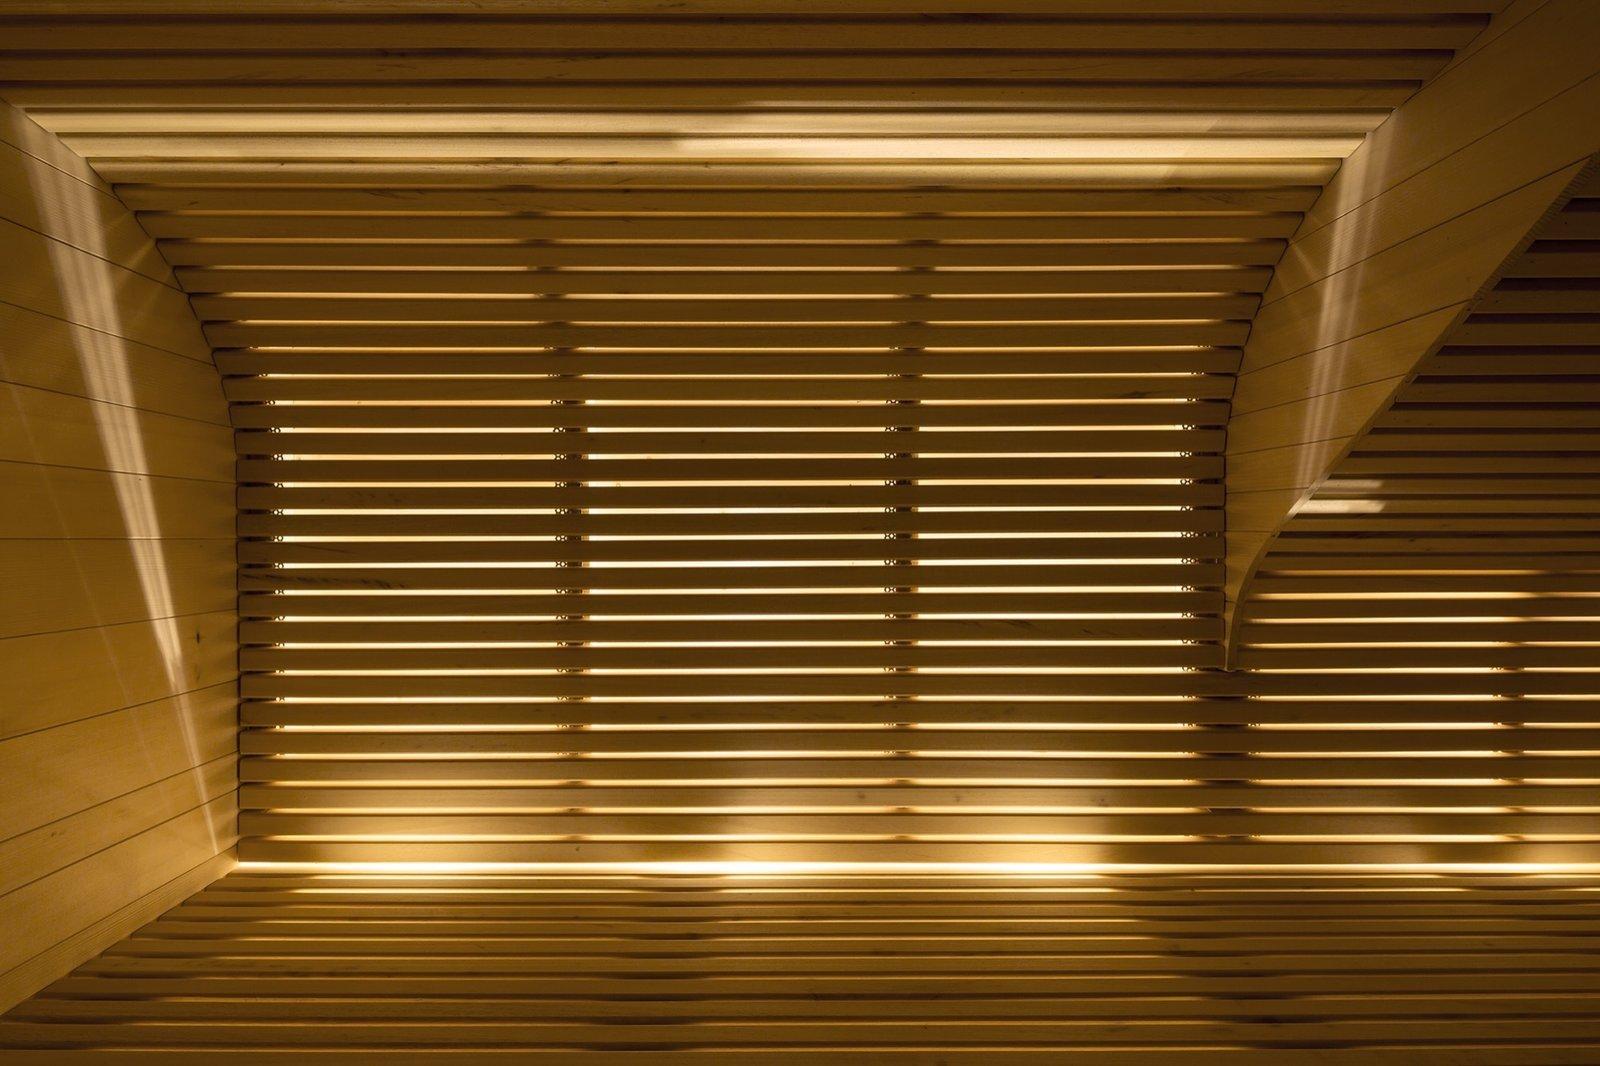 Sauna detailing